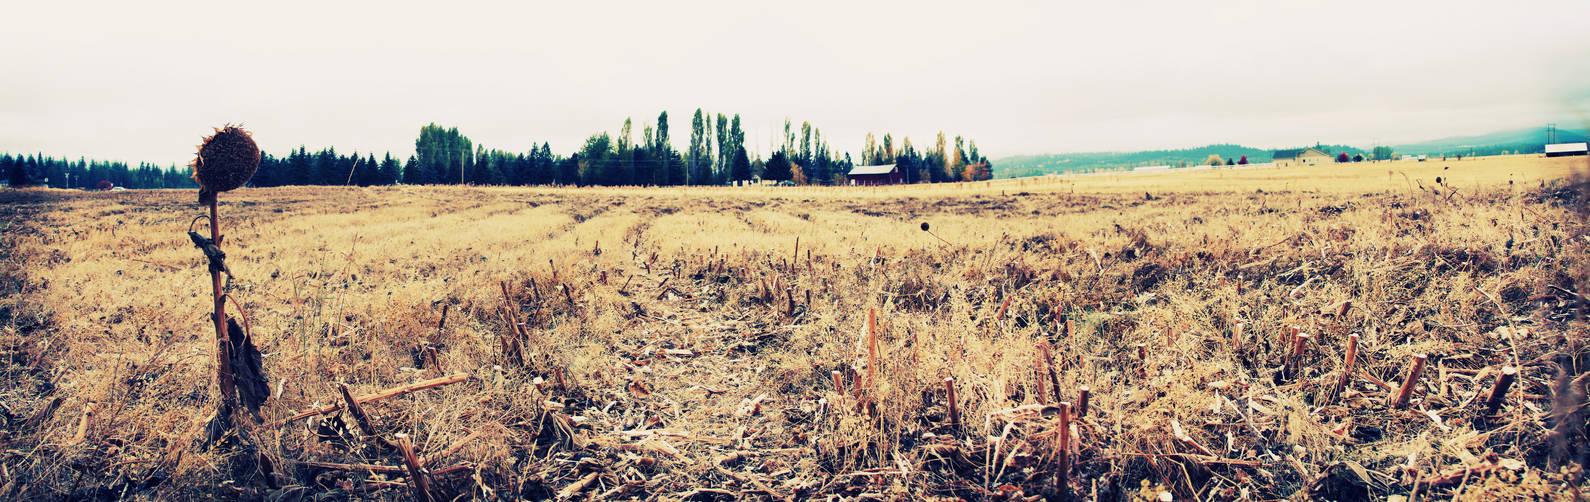 Lone Survivor by mackilvane